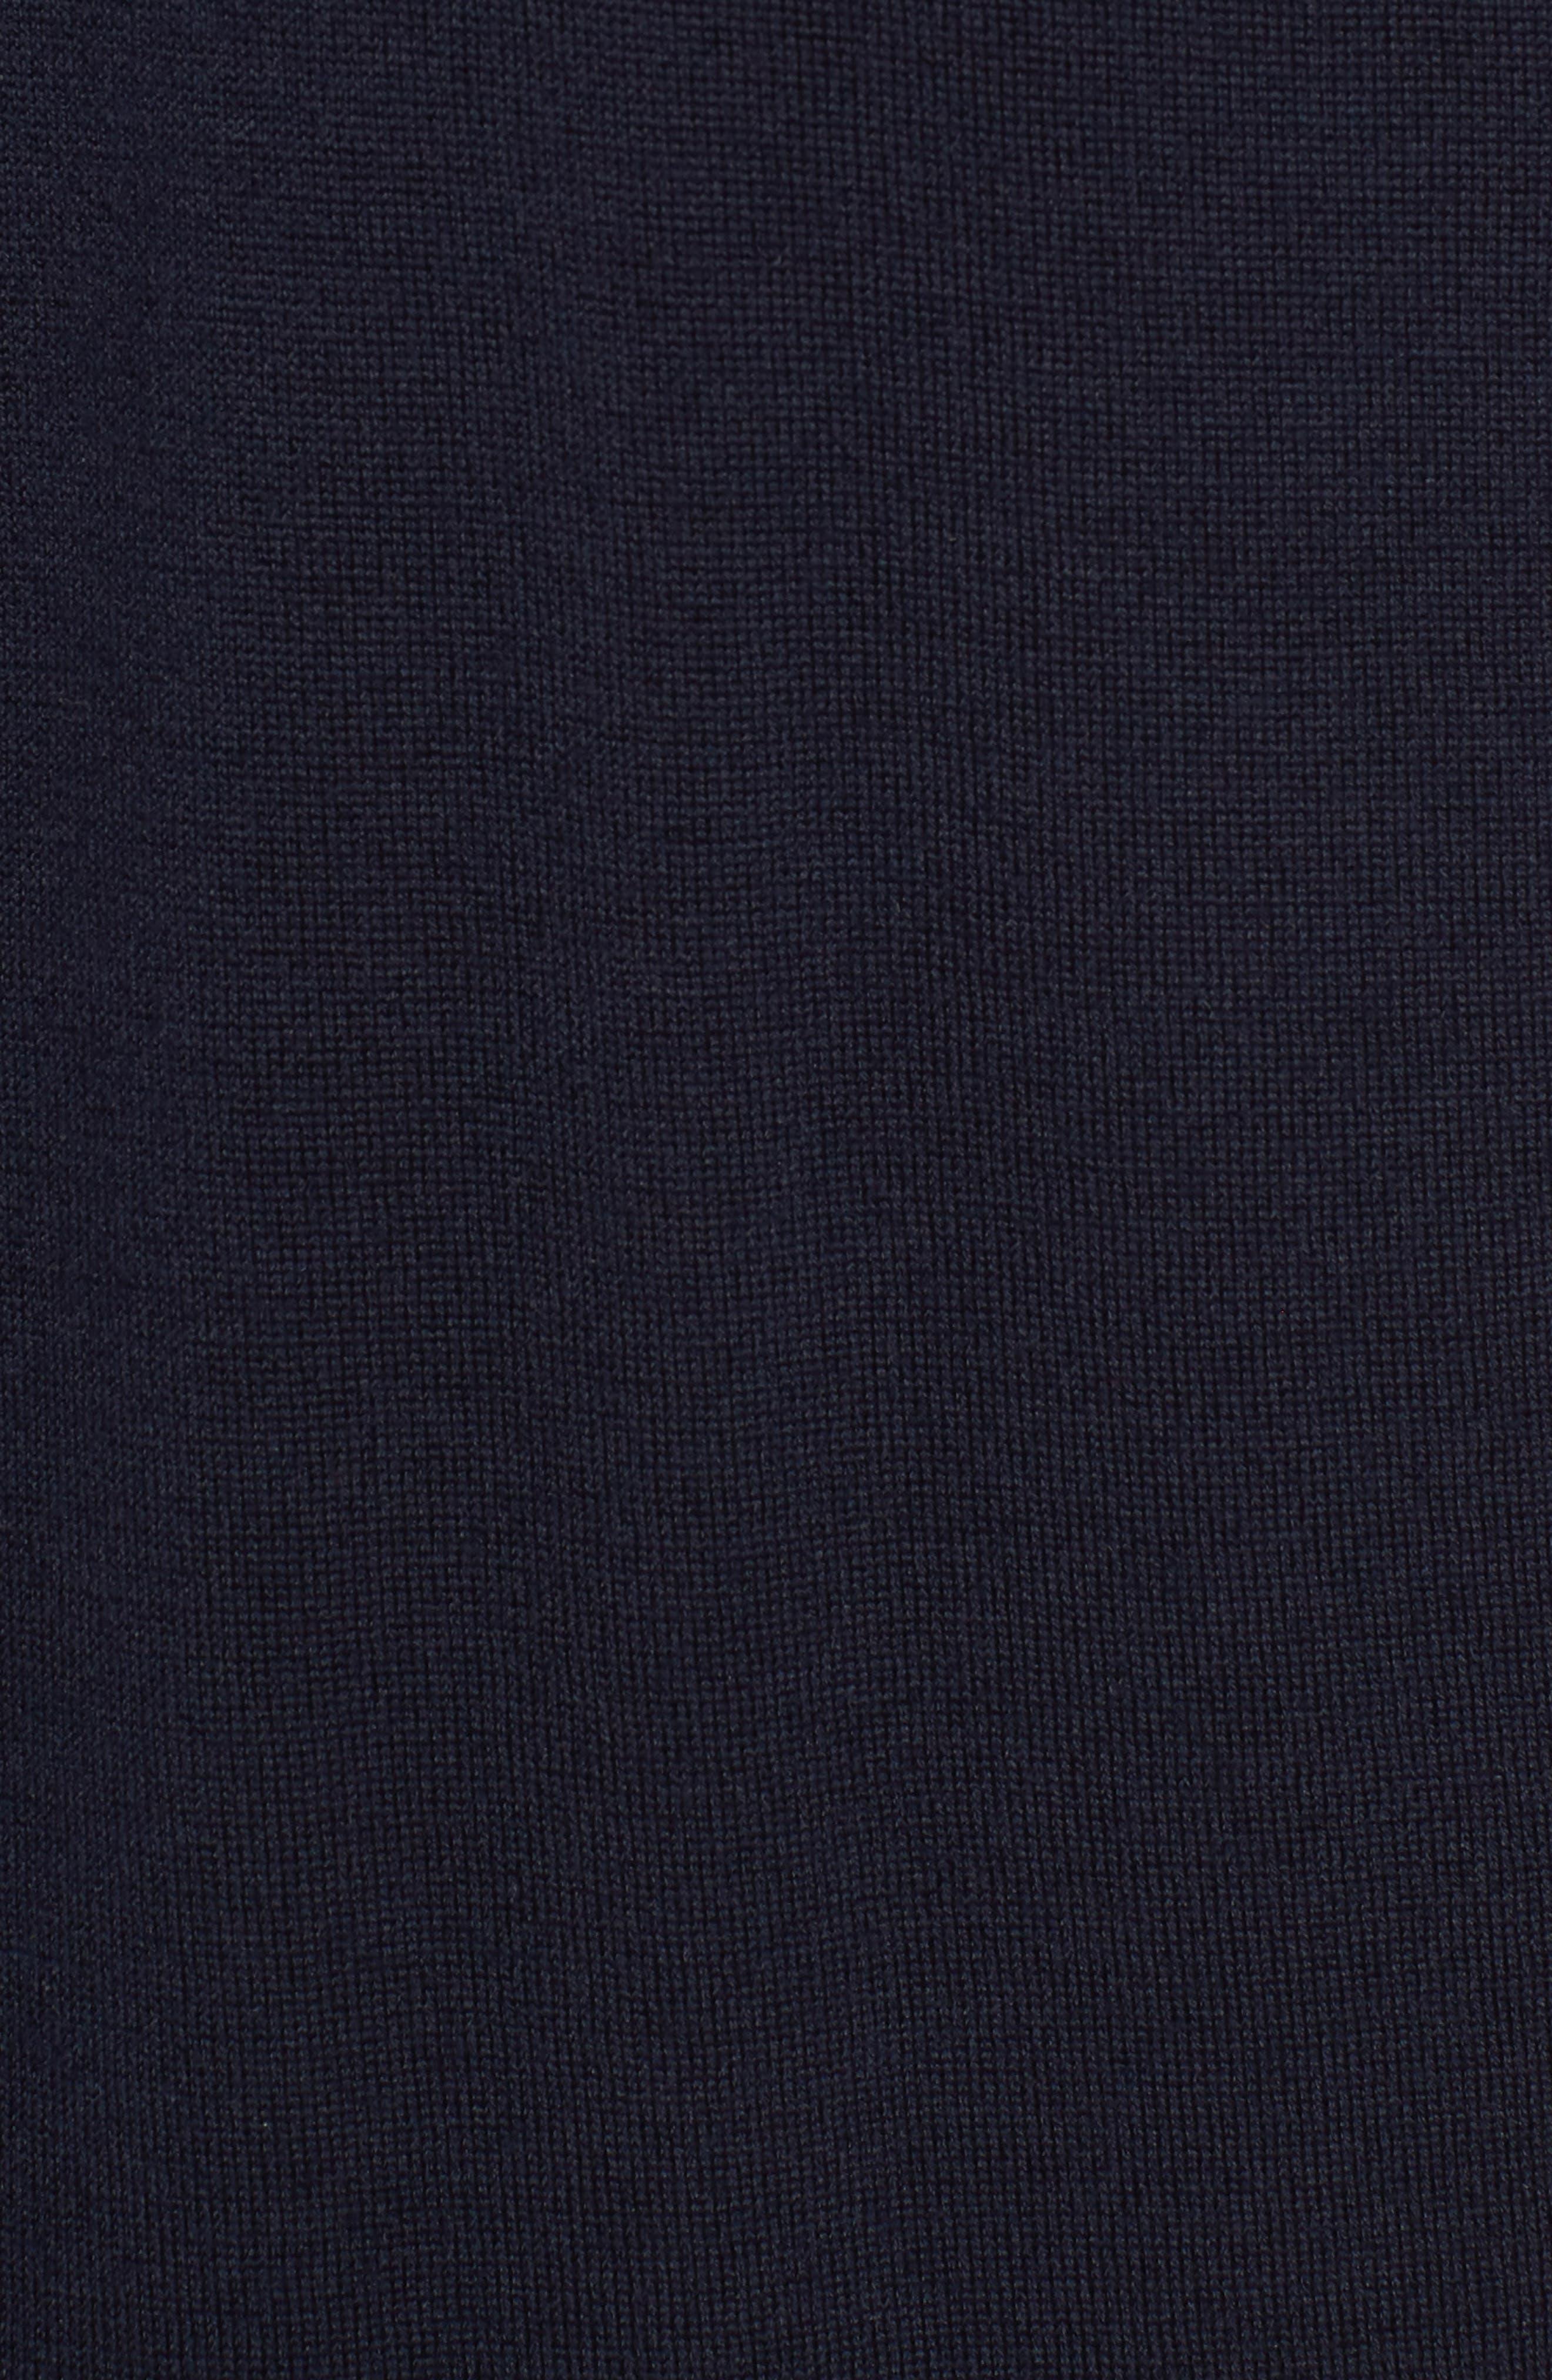 Colorblock Merino Wool Polo,                             Alternate thumbnail 5, color,                             Midnight/ Indigo